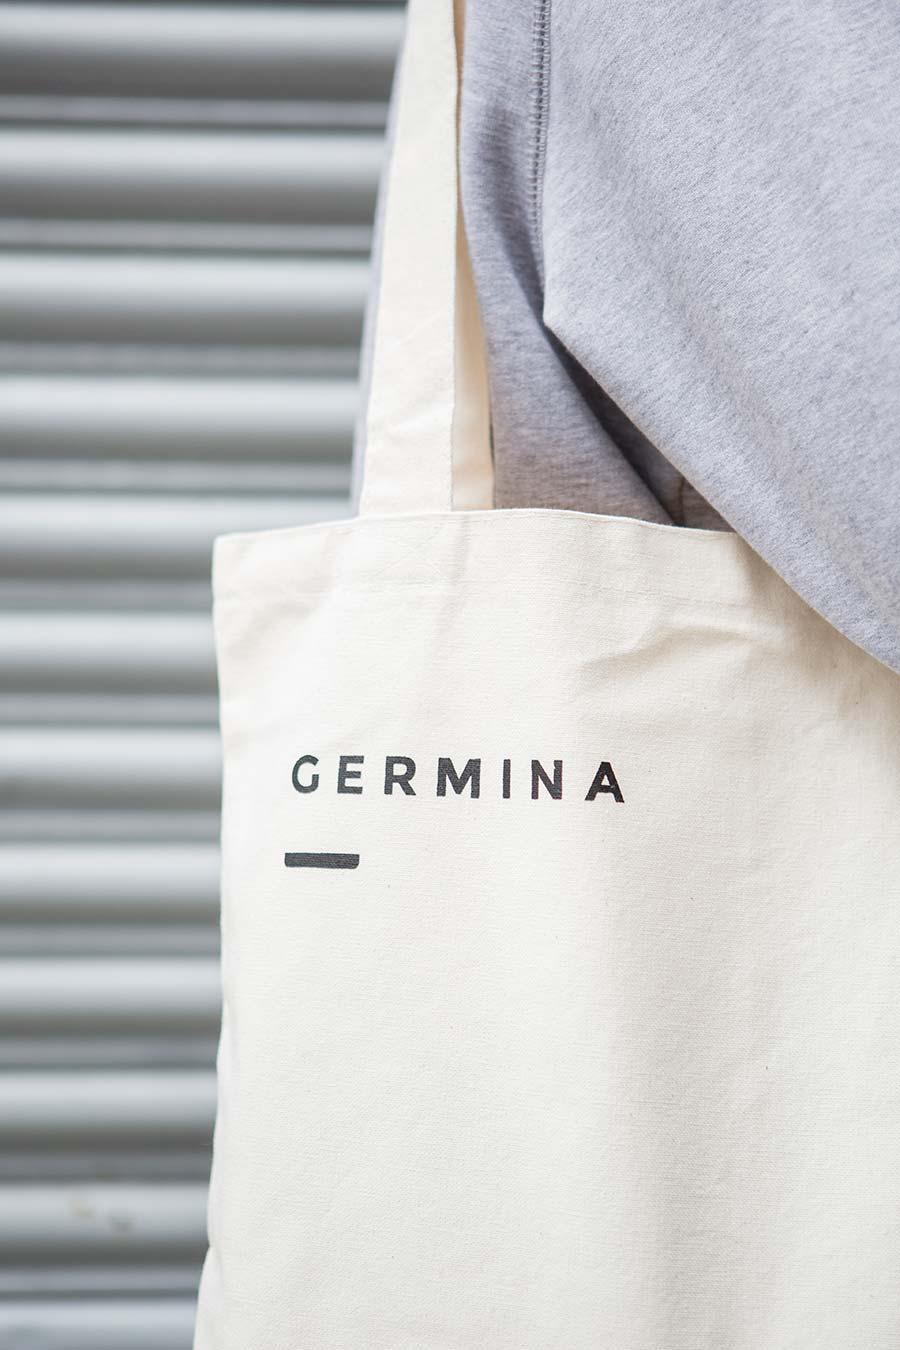 Germina identity design